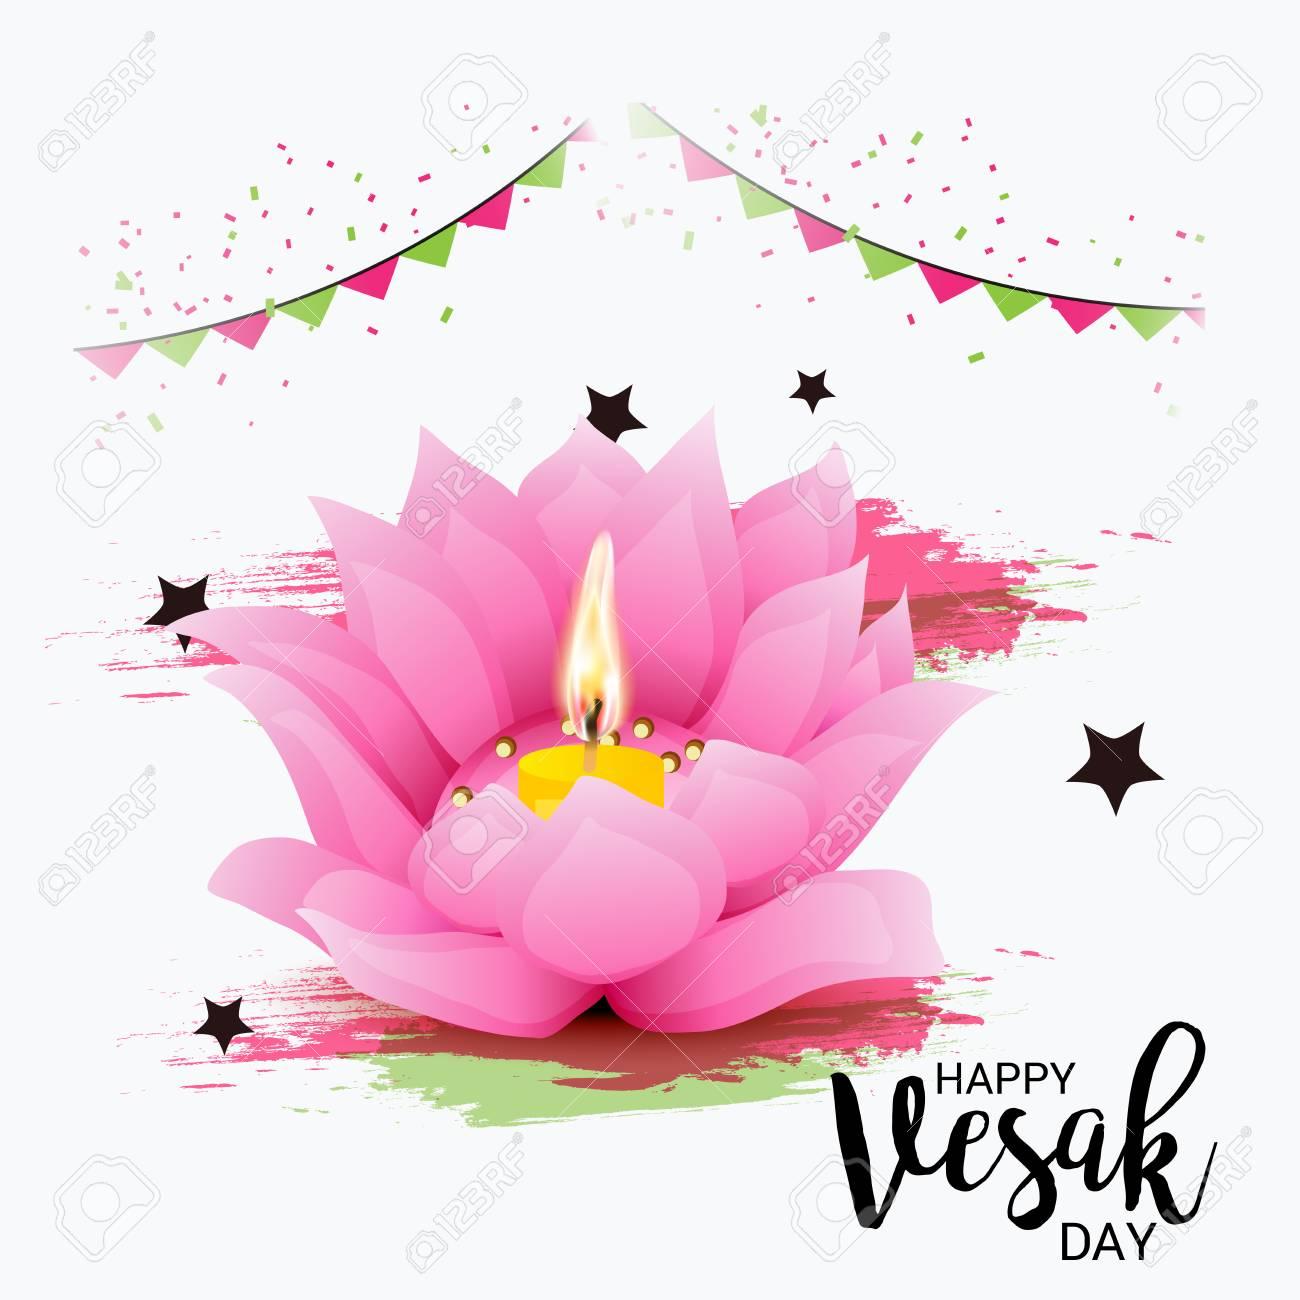 Wesak day clipart jpg transparent Georgia Buddhist Vihara: Vesak Celebration 2019 on Saturday ... jpg transparent